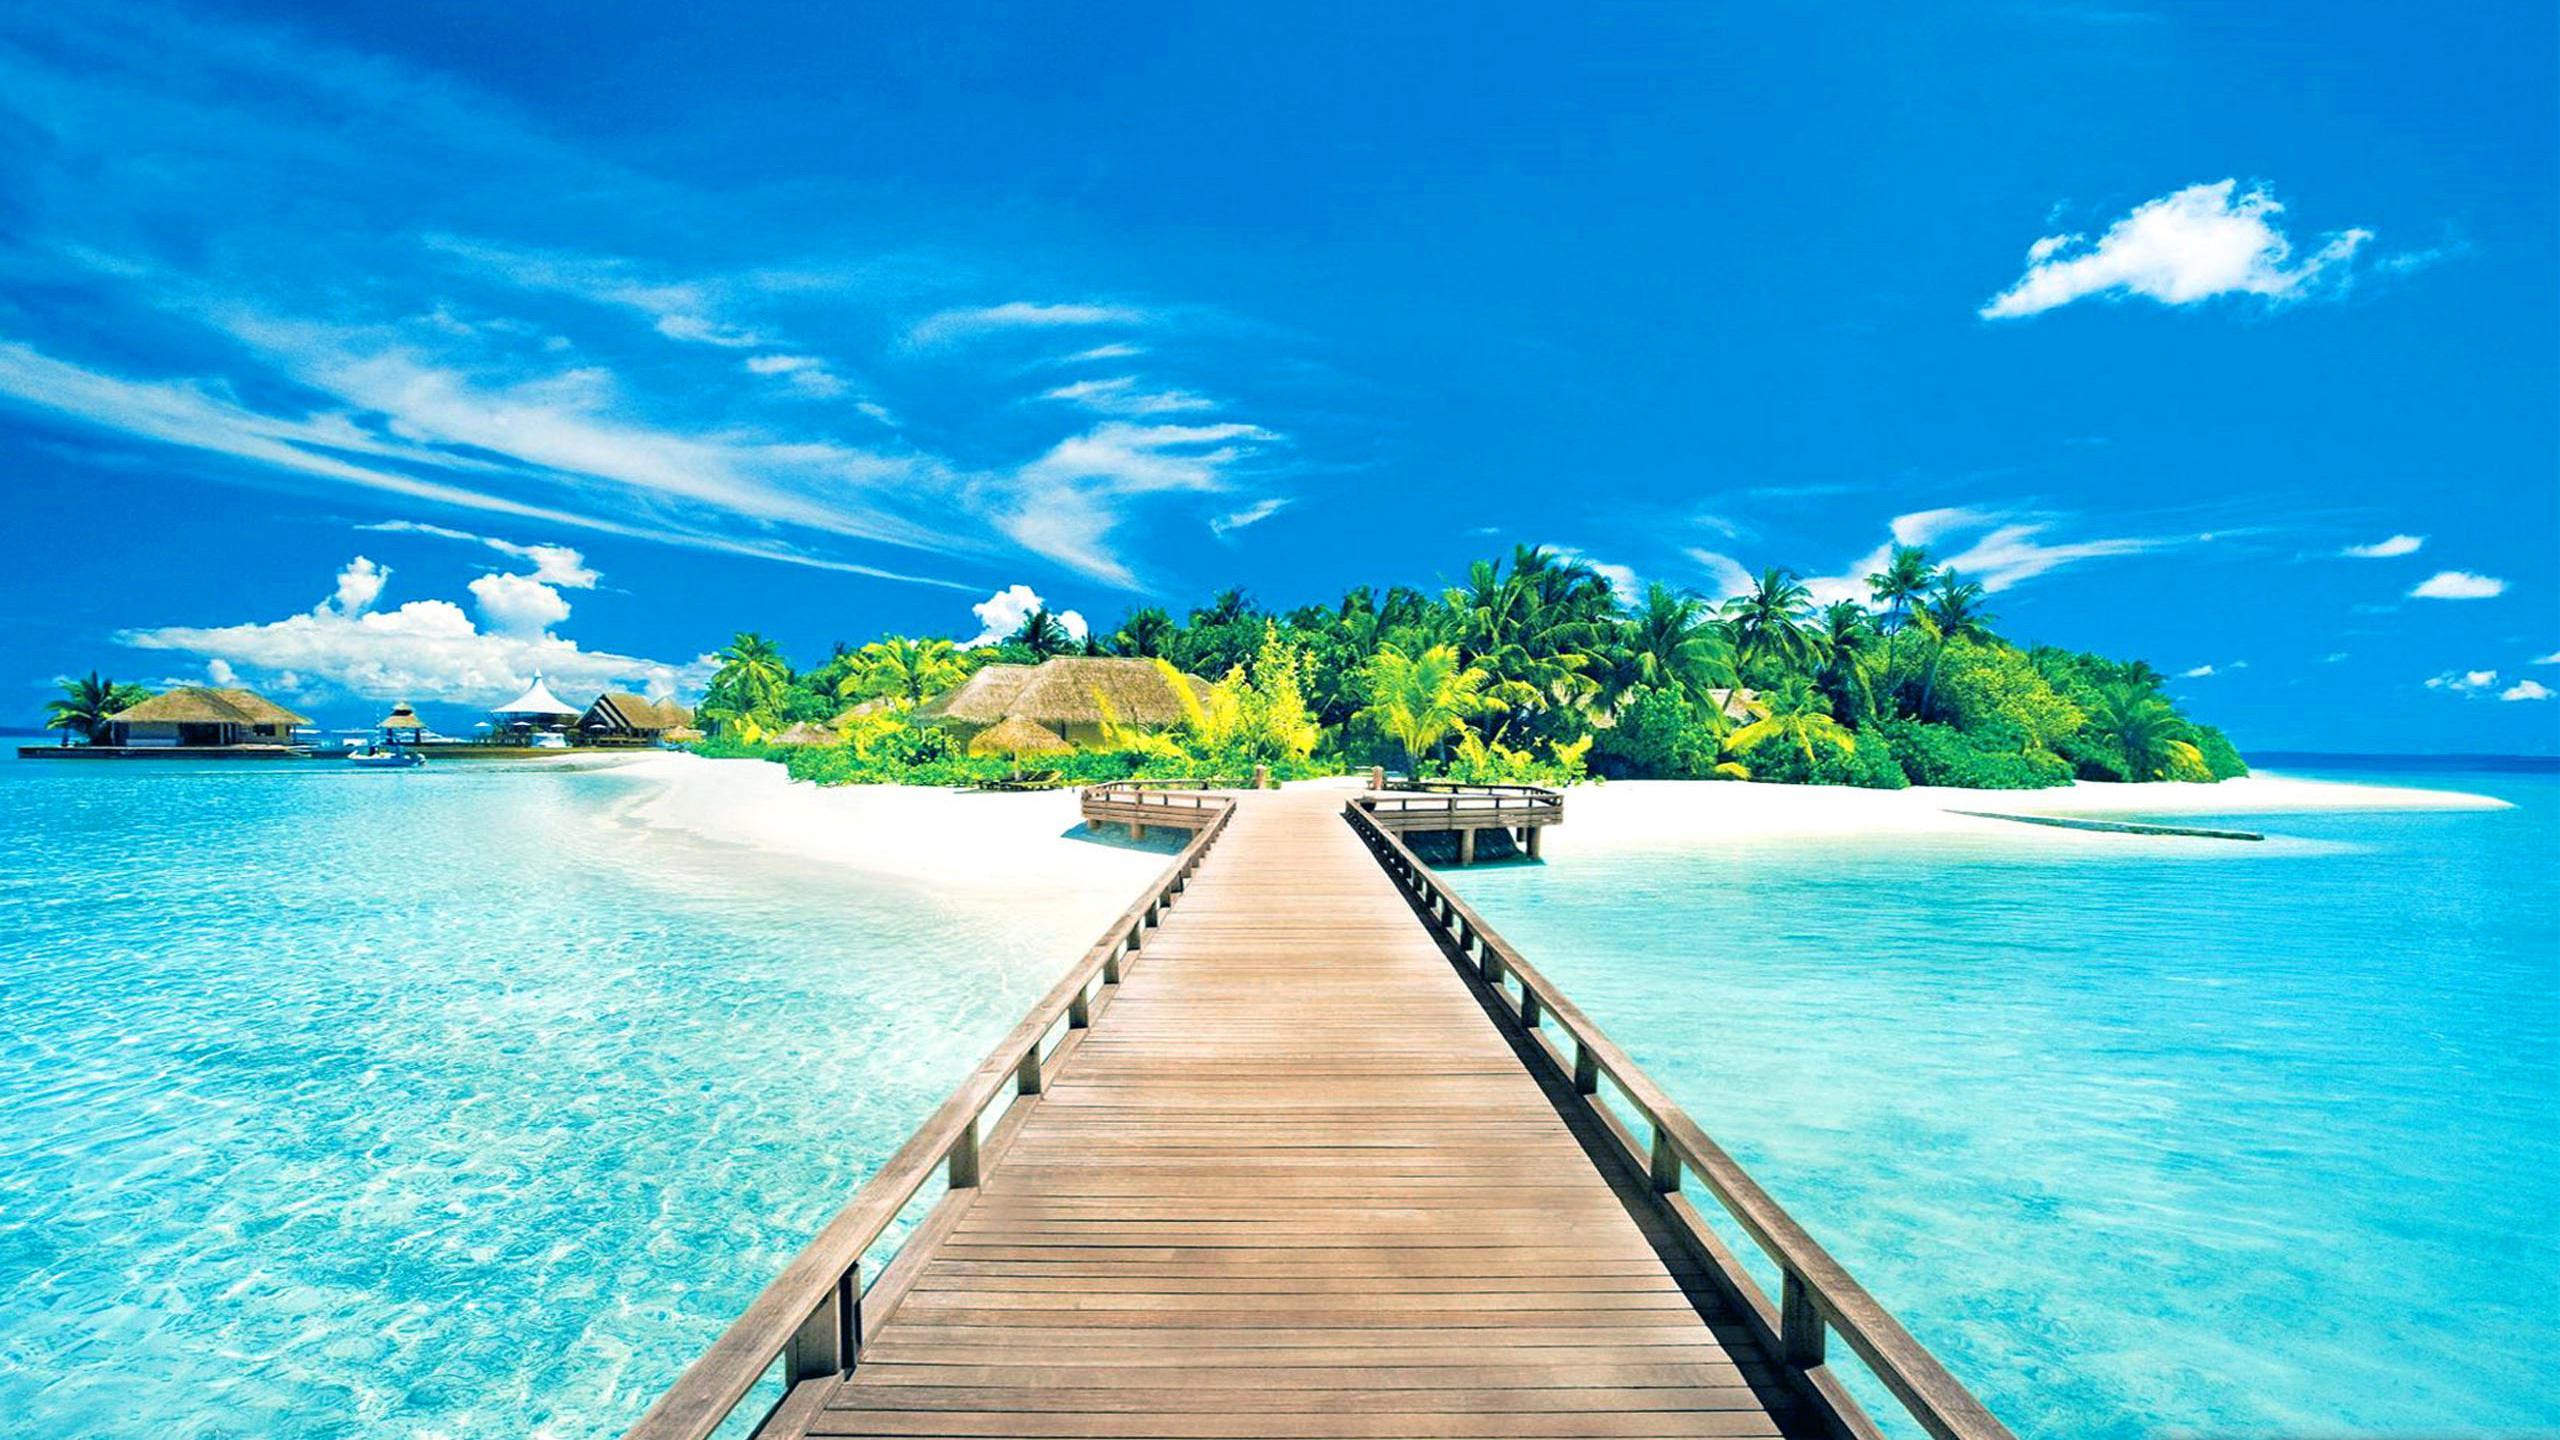 Pics Photos - Wallpaper Hd Tropical Island Backgrounds ...